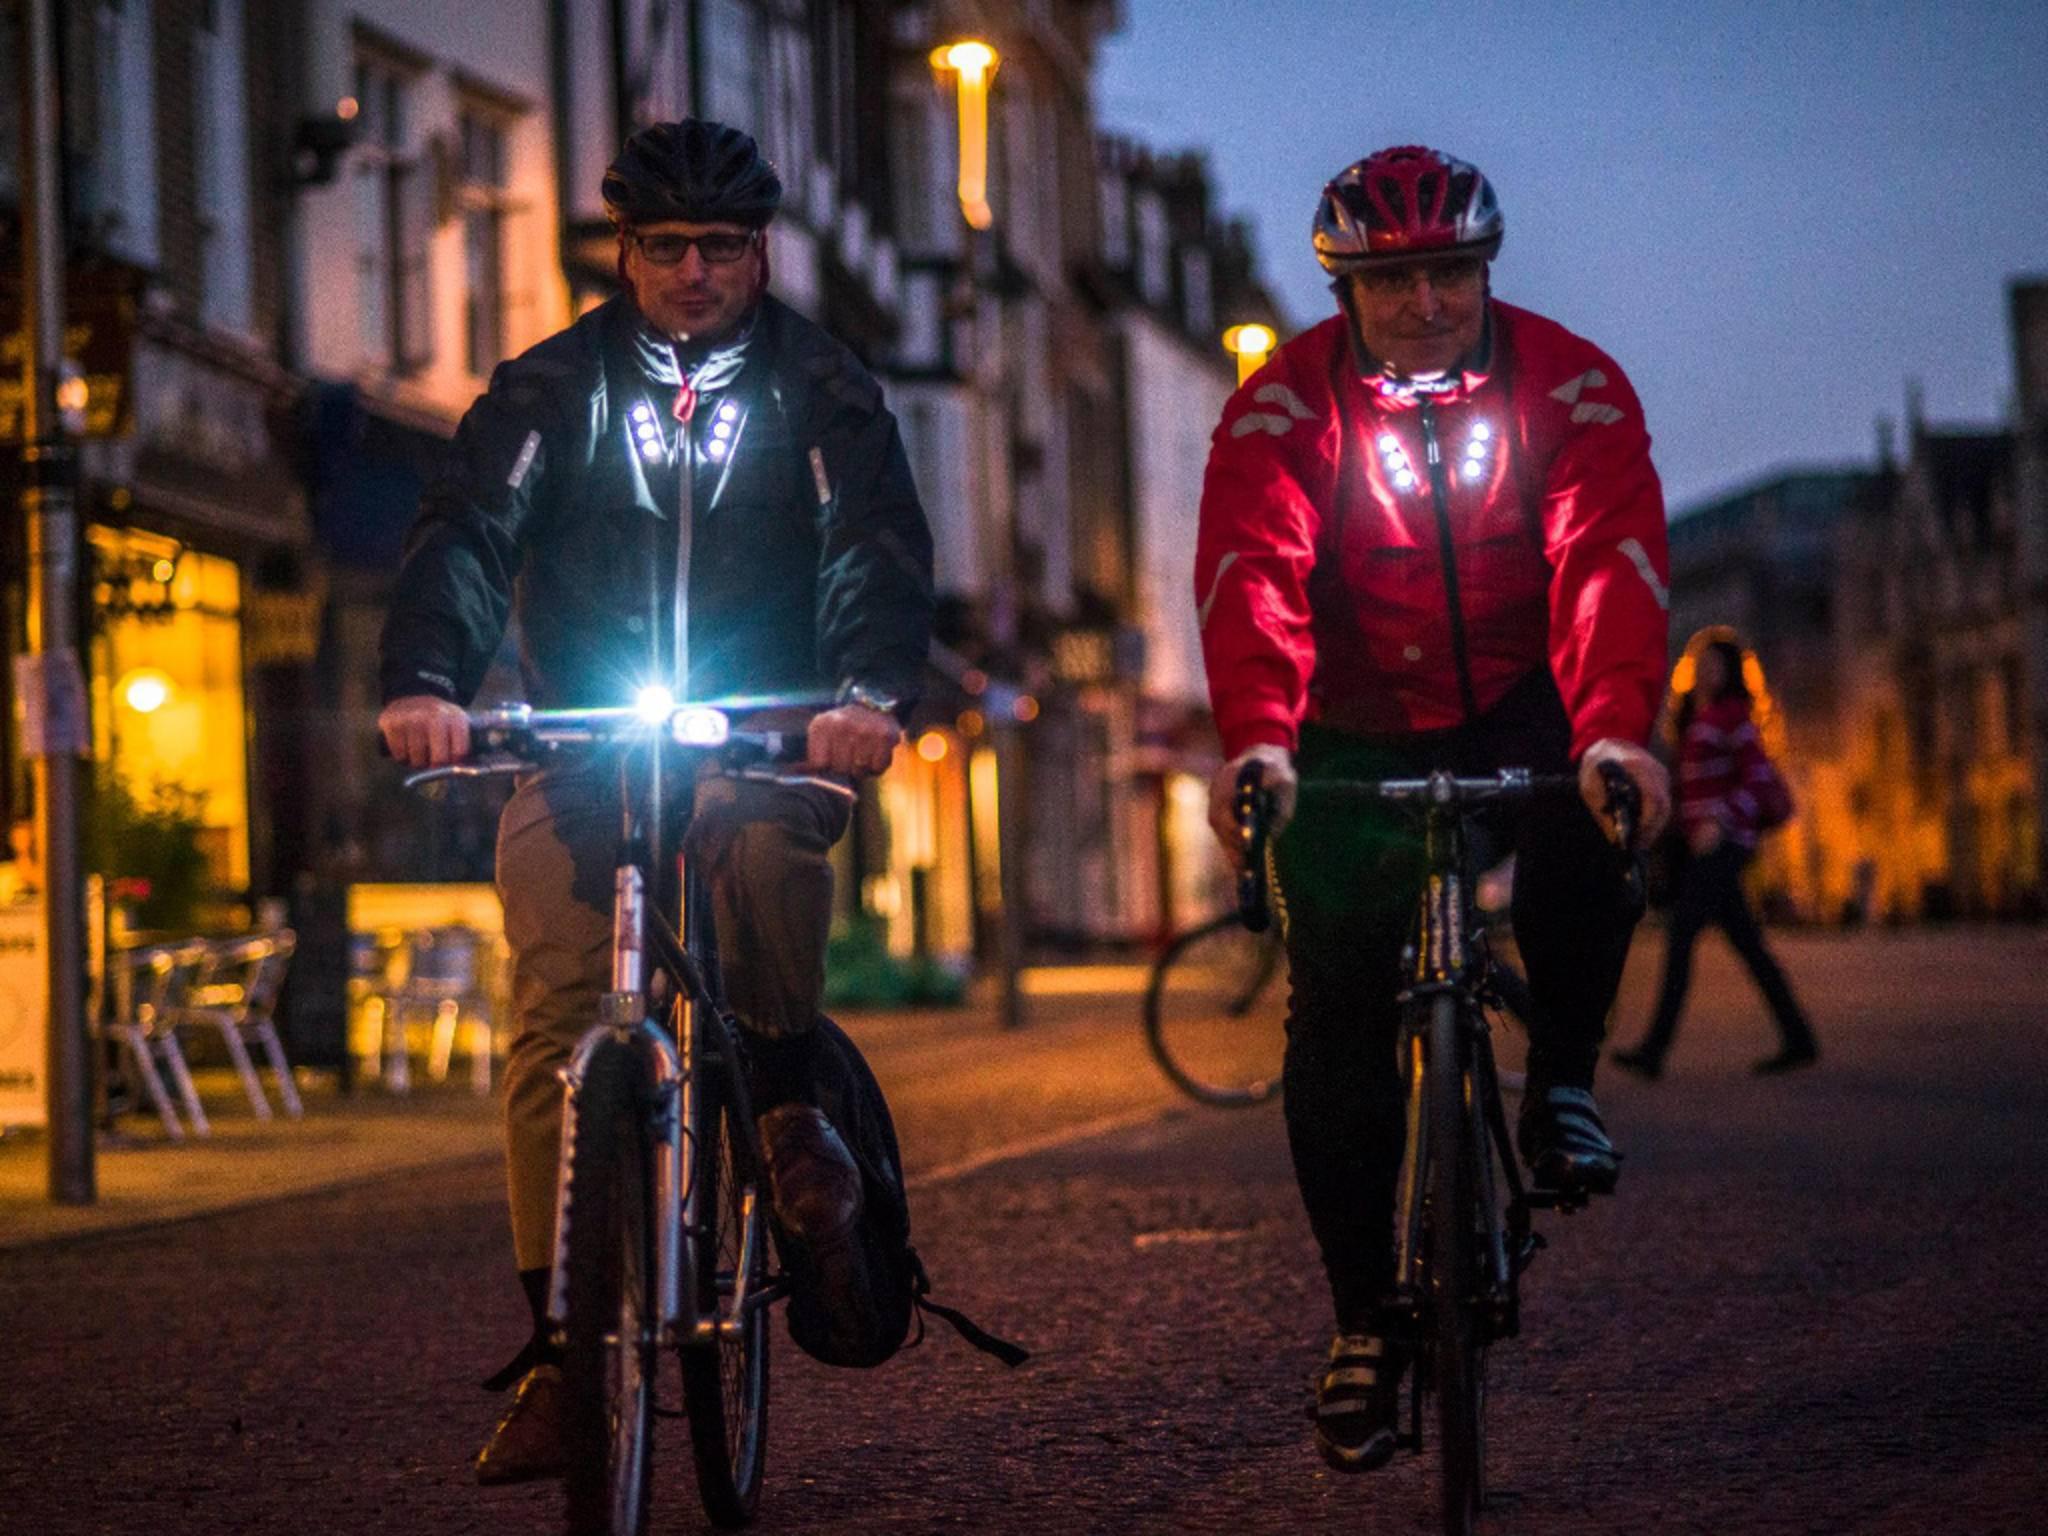 LED-Fahrradjacke von Visijax